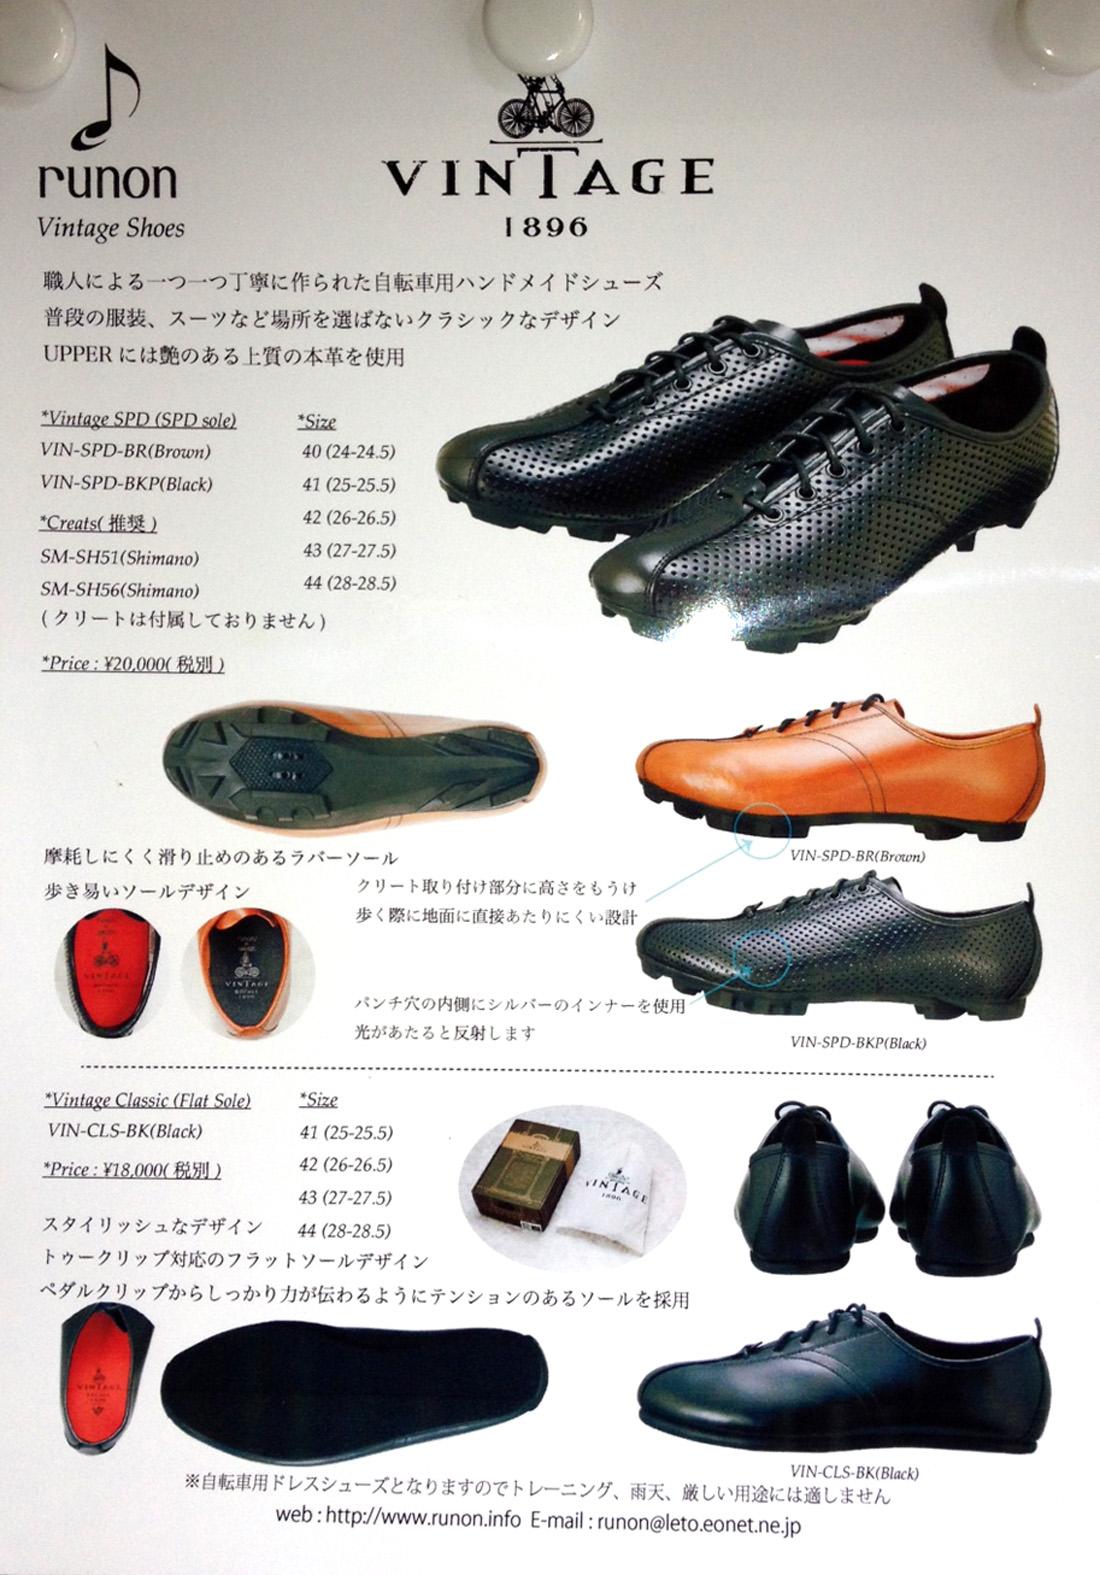 VINTAGE Shoes_d0182937_1736060.jpg